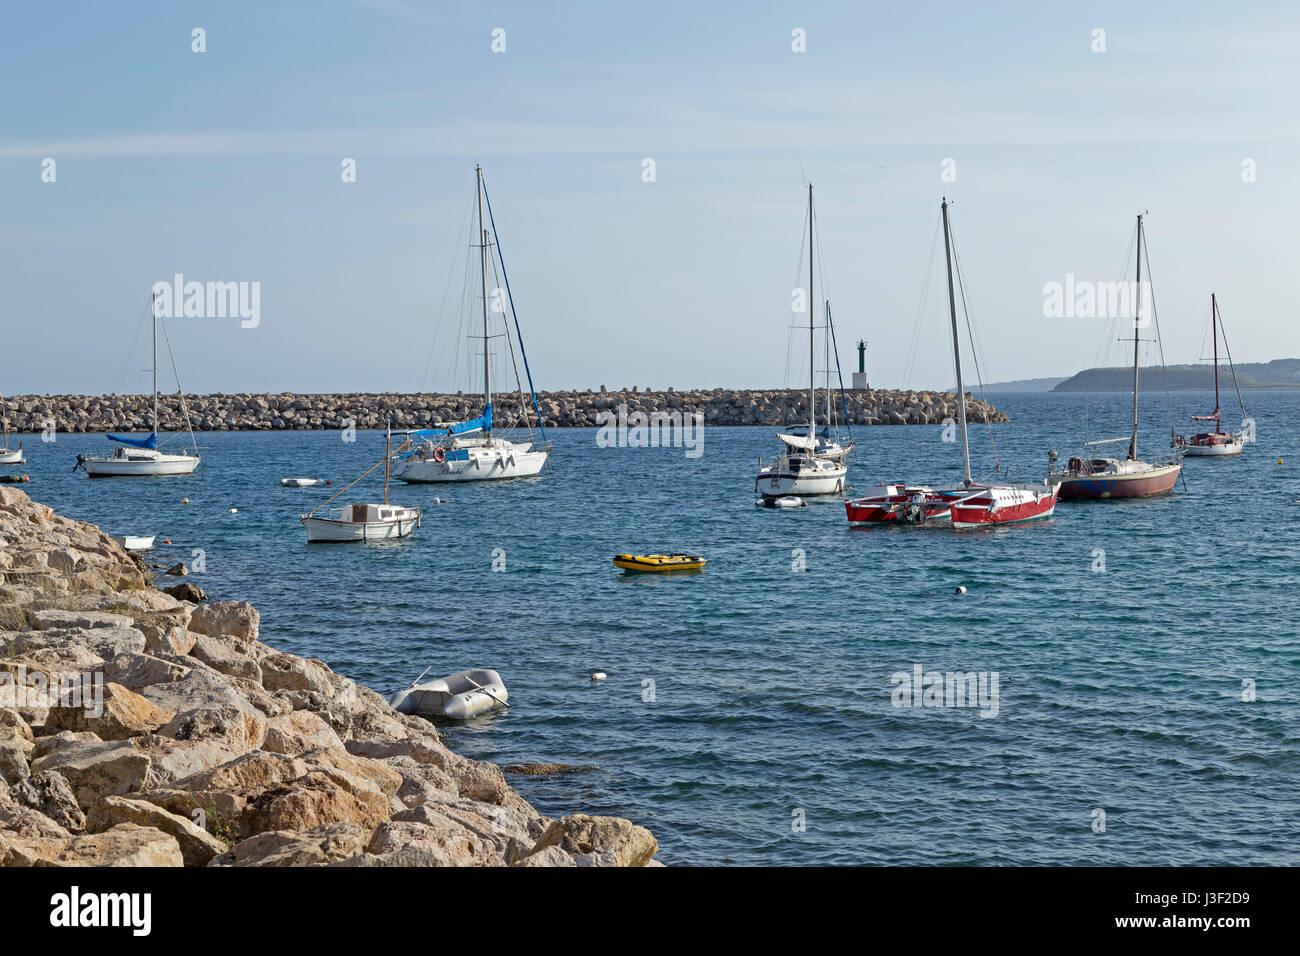 marina in Portals Nous, Mallorca, Spain - Stock Image